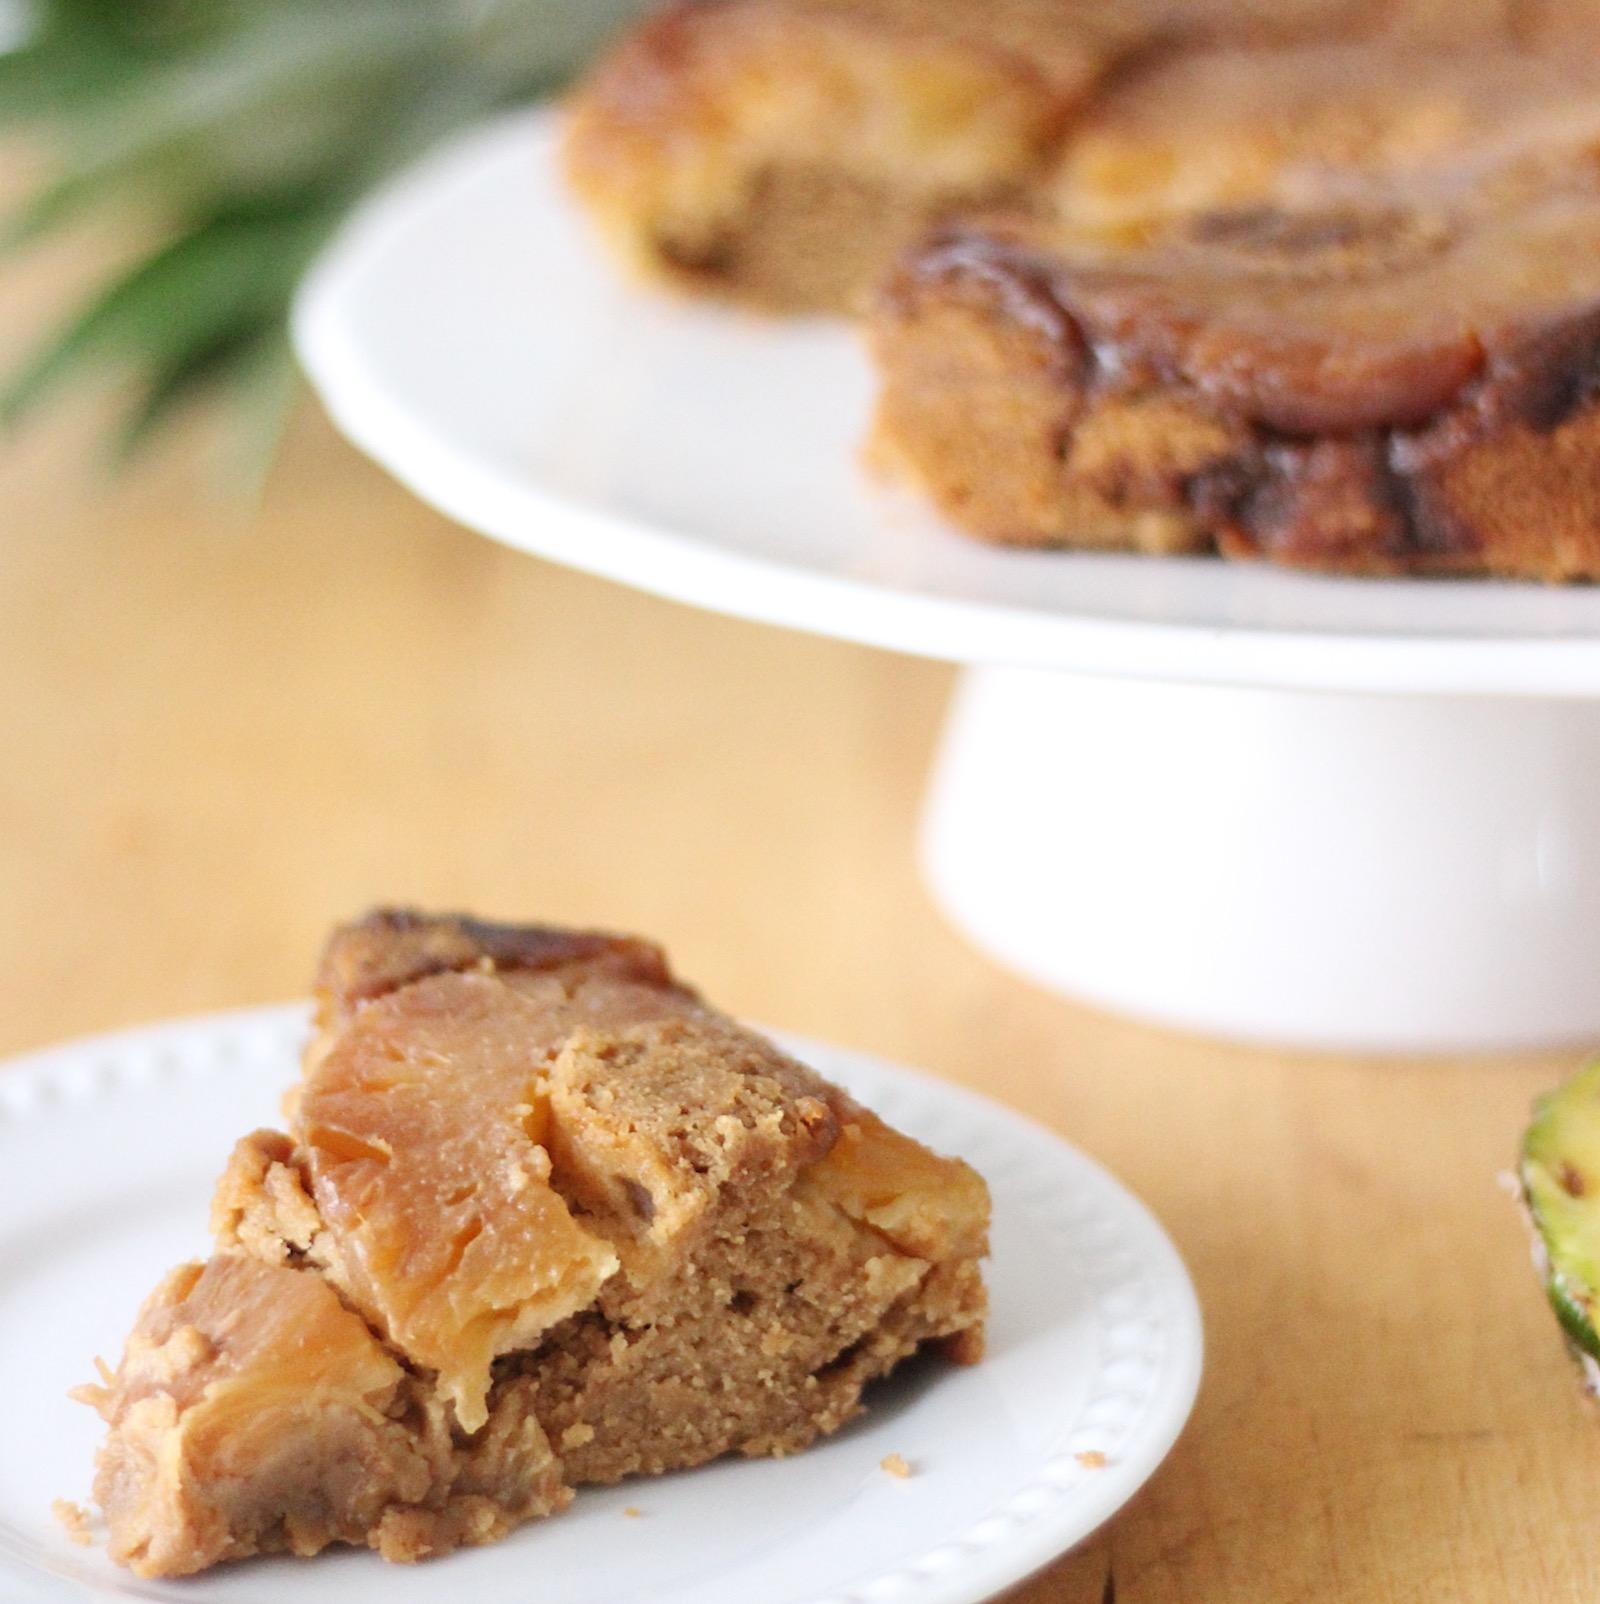 Gluten-free nut-free Paleo pineapple upside down cake